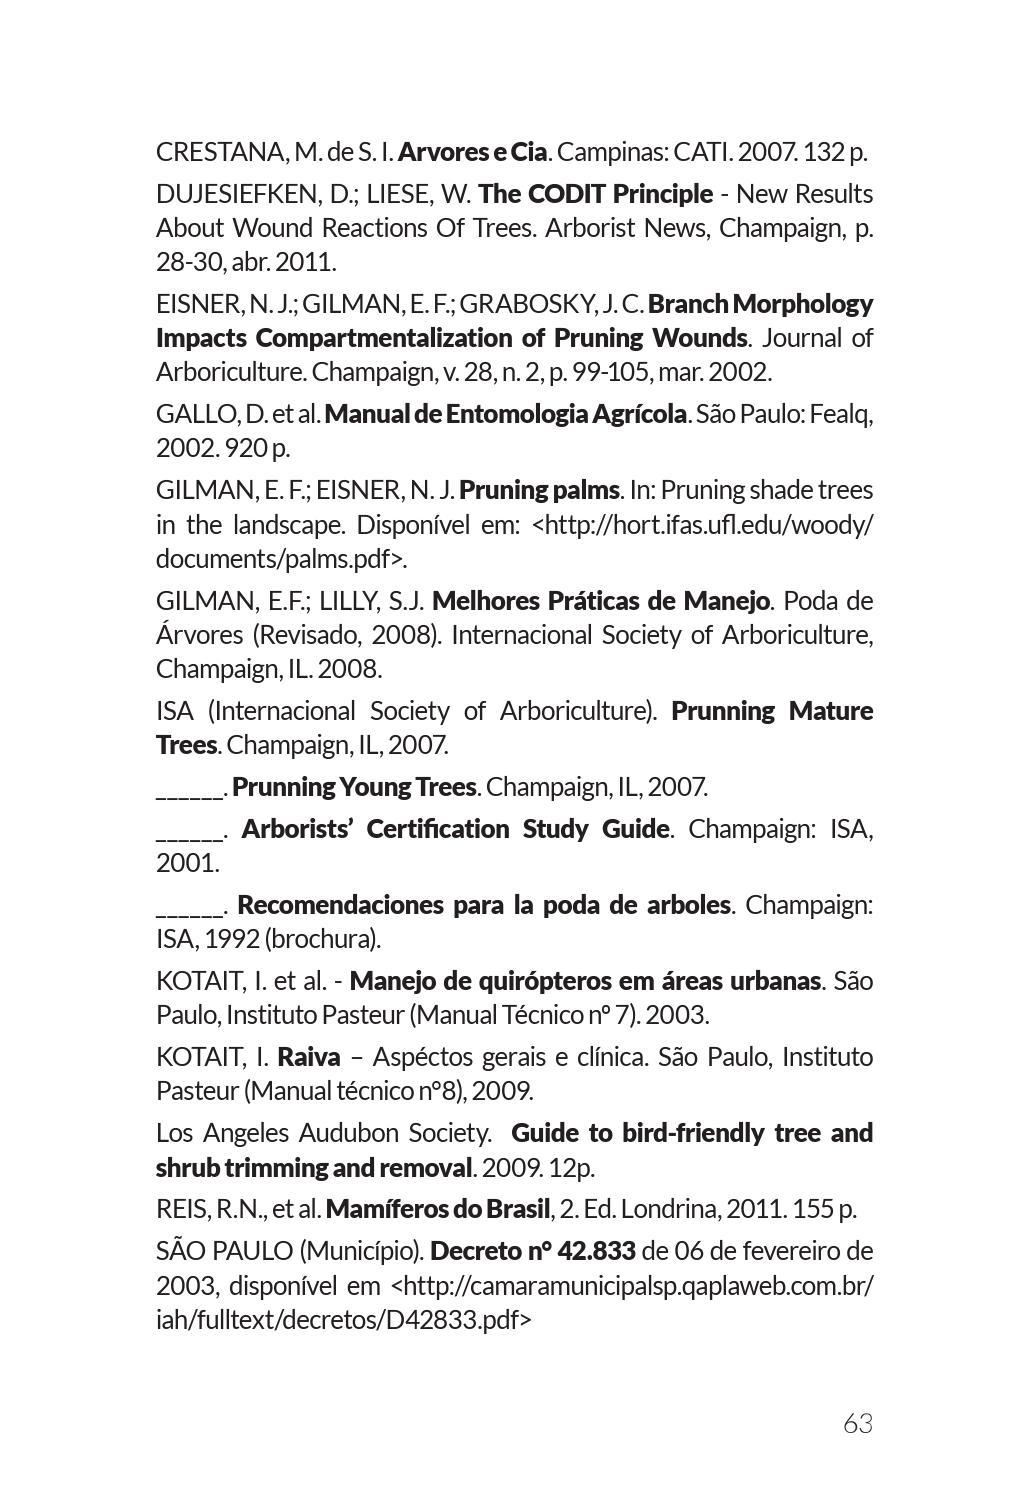 manual técnico de poda de árvores pdf